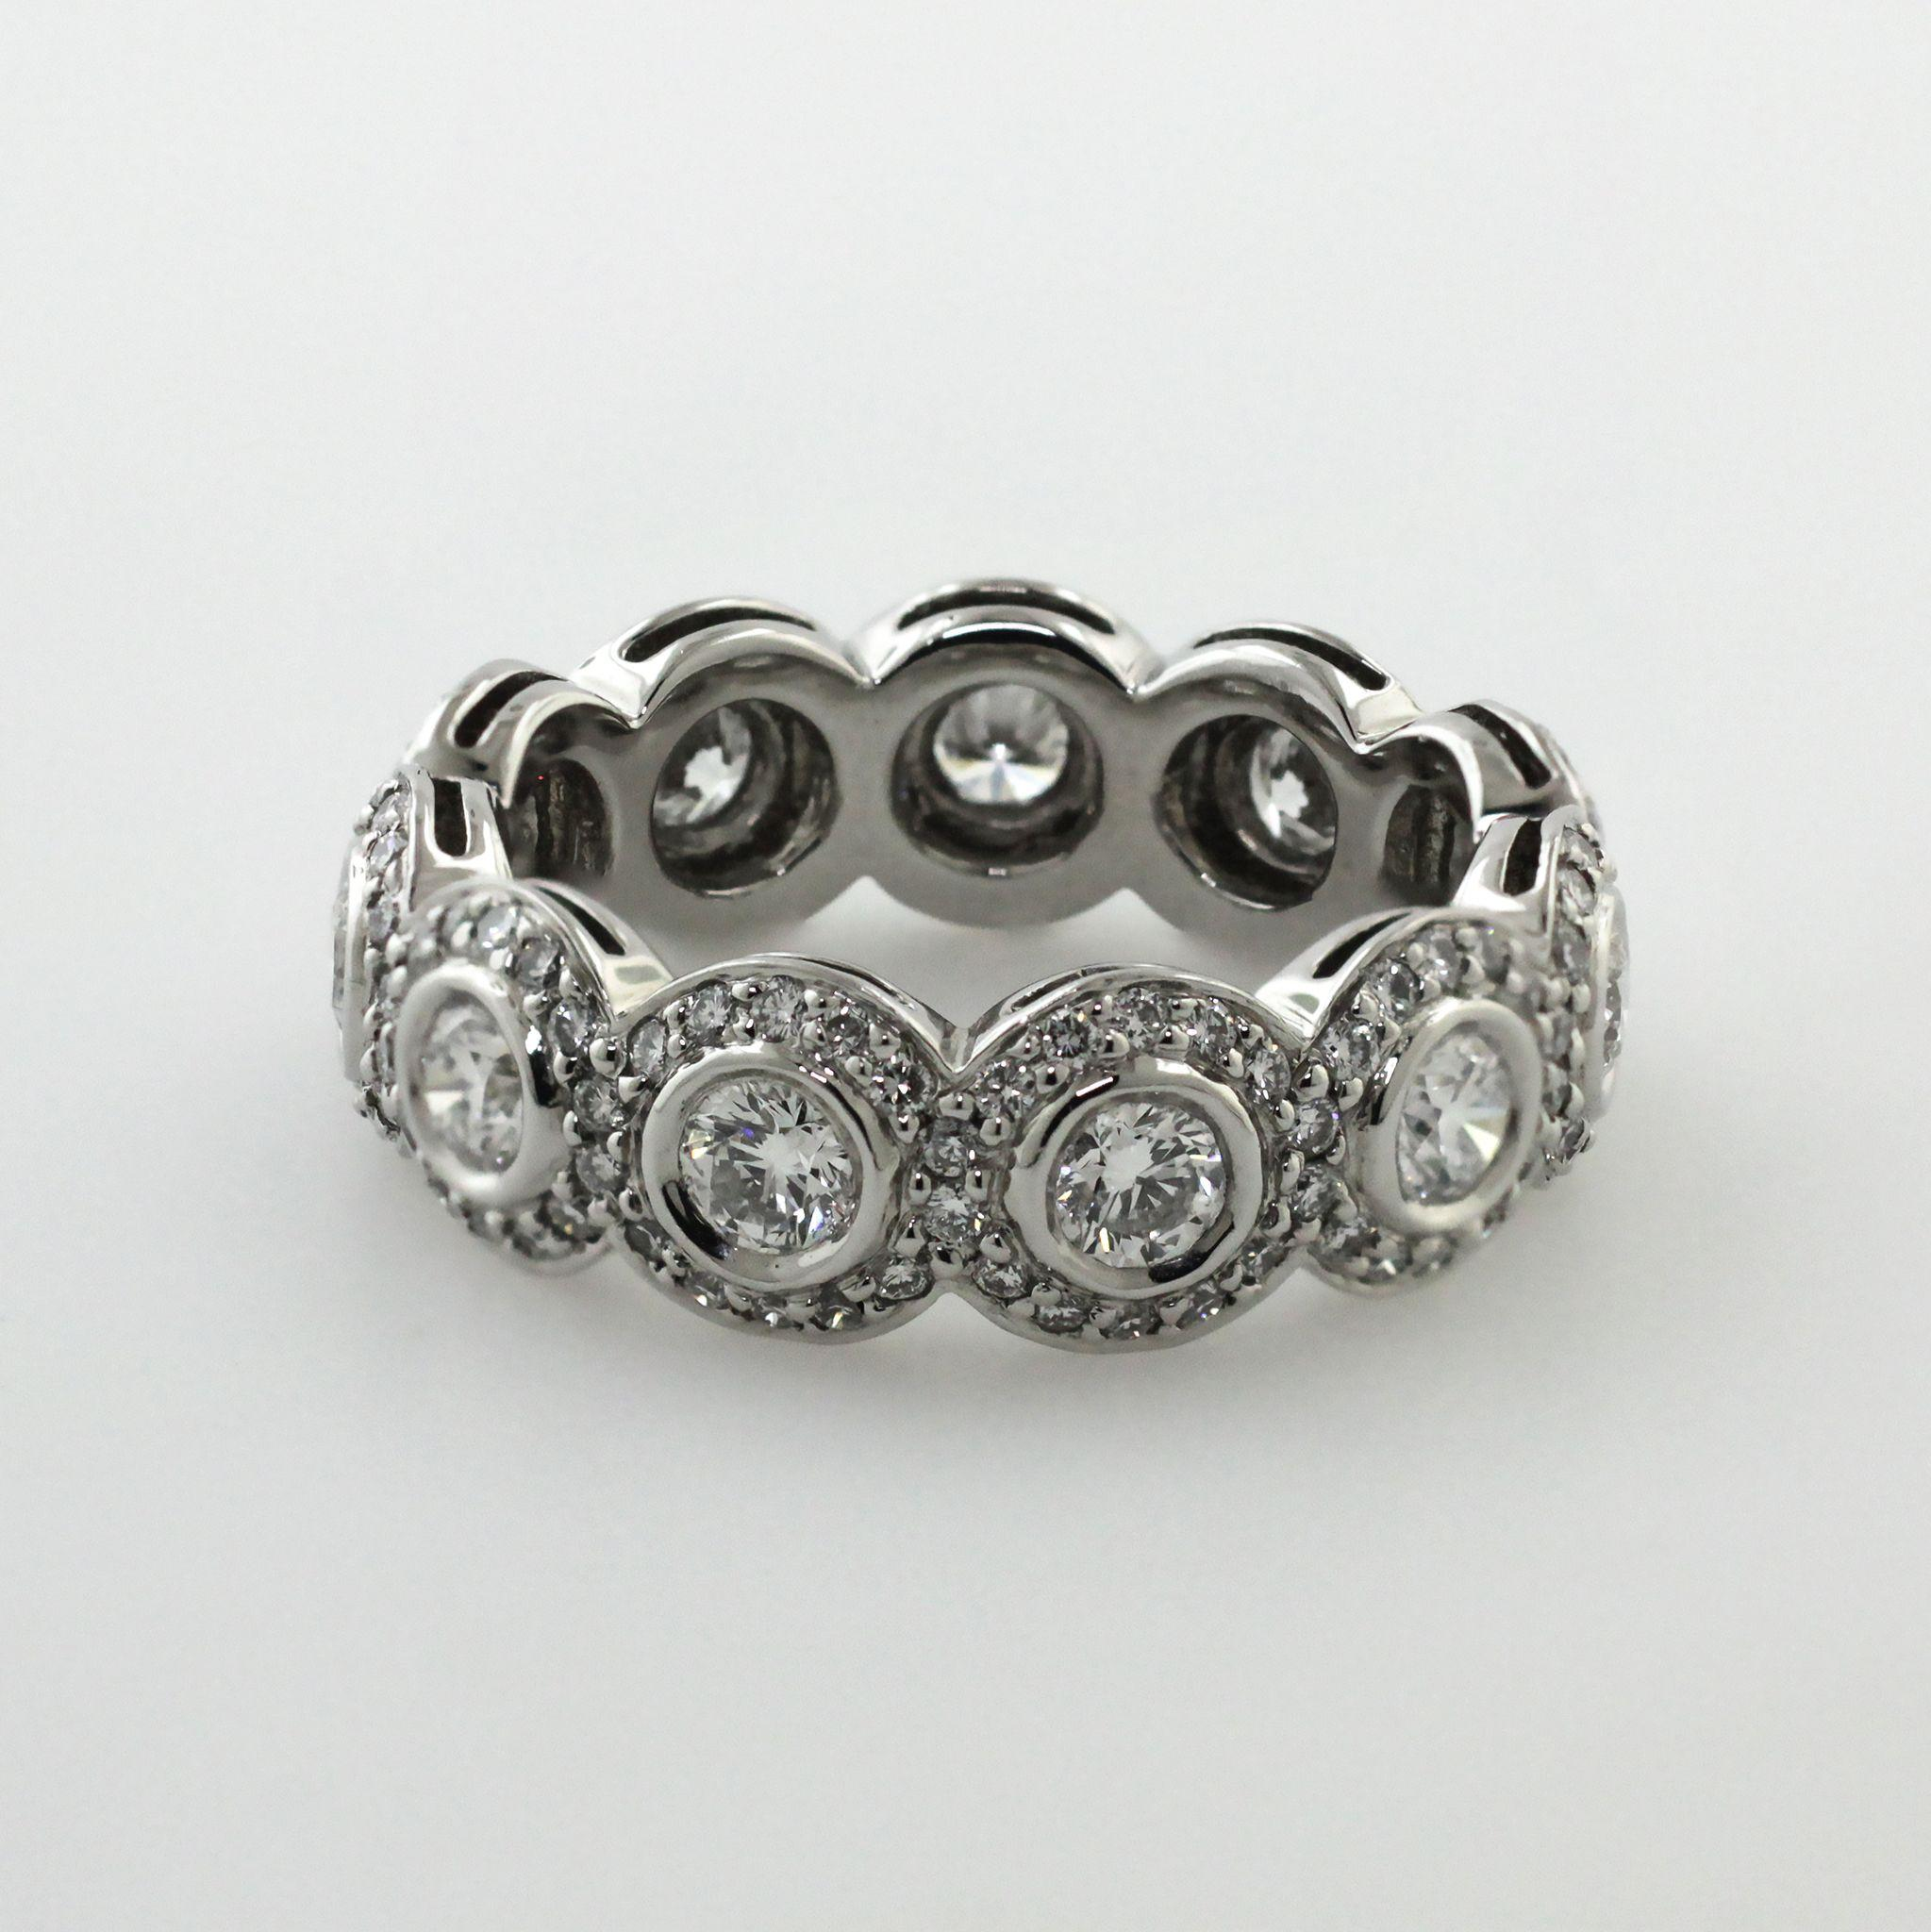 RITANI PLATINUM DIAMOND ETERNITY WEDDING BAND ENDLESS LOVE COLLECTION SIZE 625